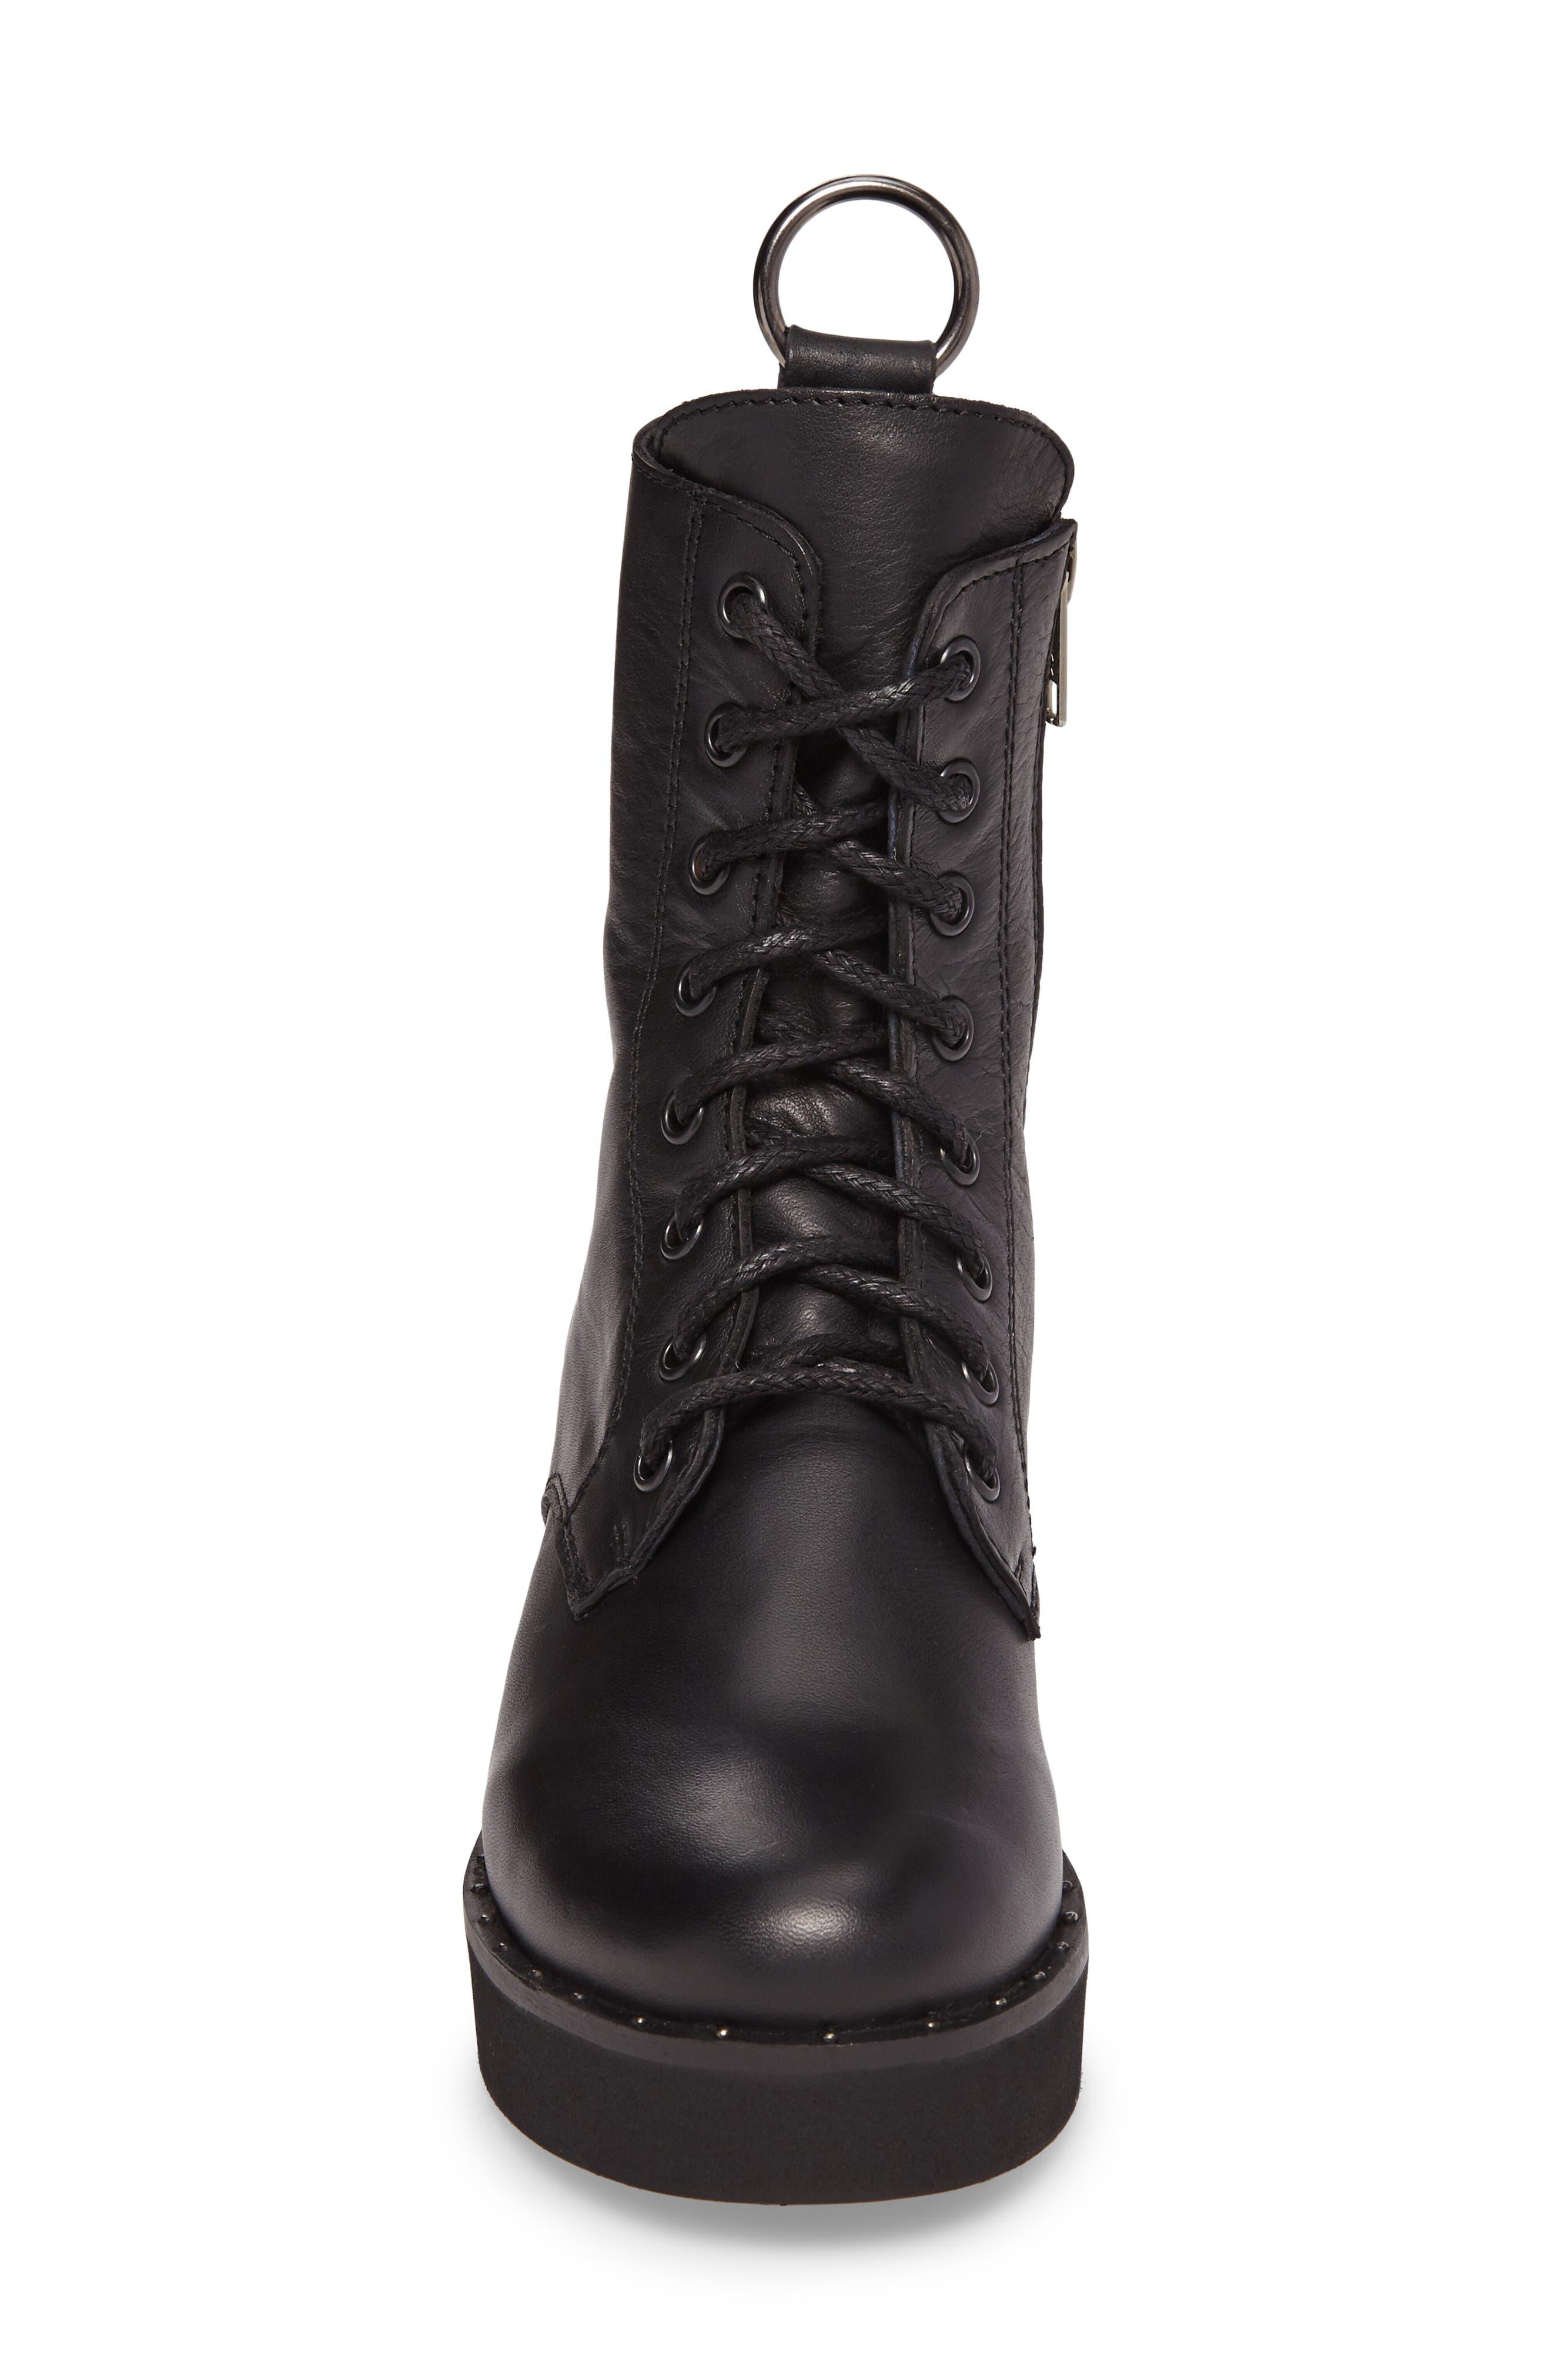 Rocco Combat Boot,                             Alternate thumbnail 4, color,                             Black Leather